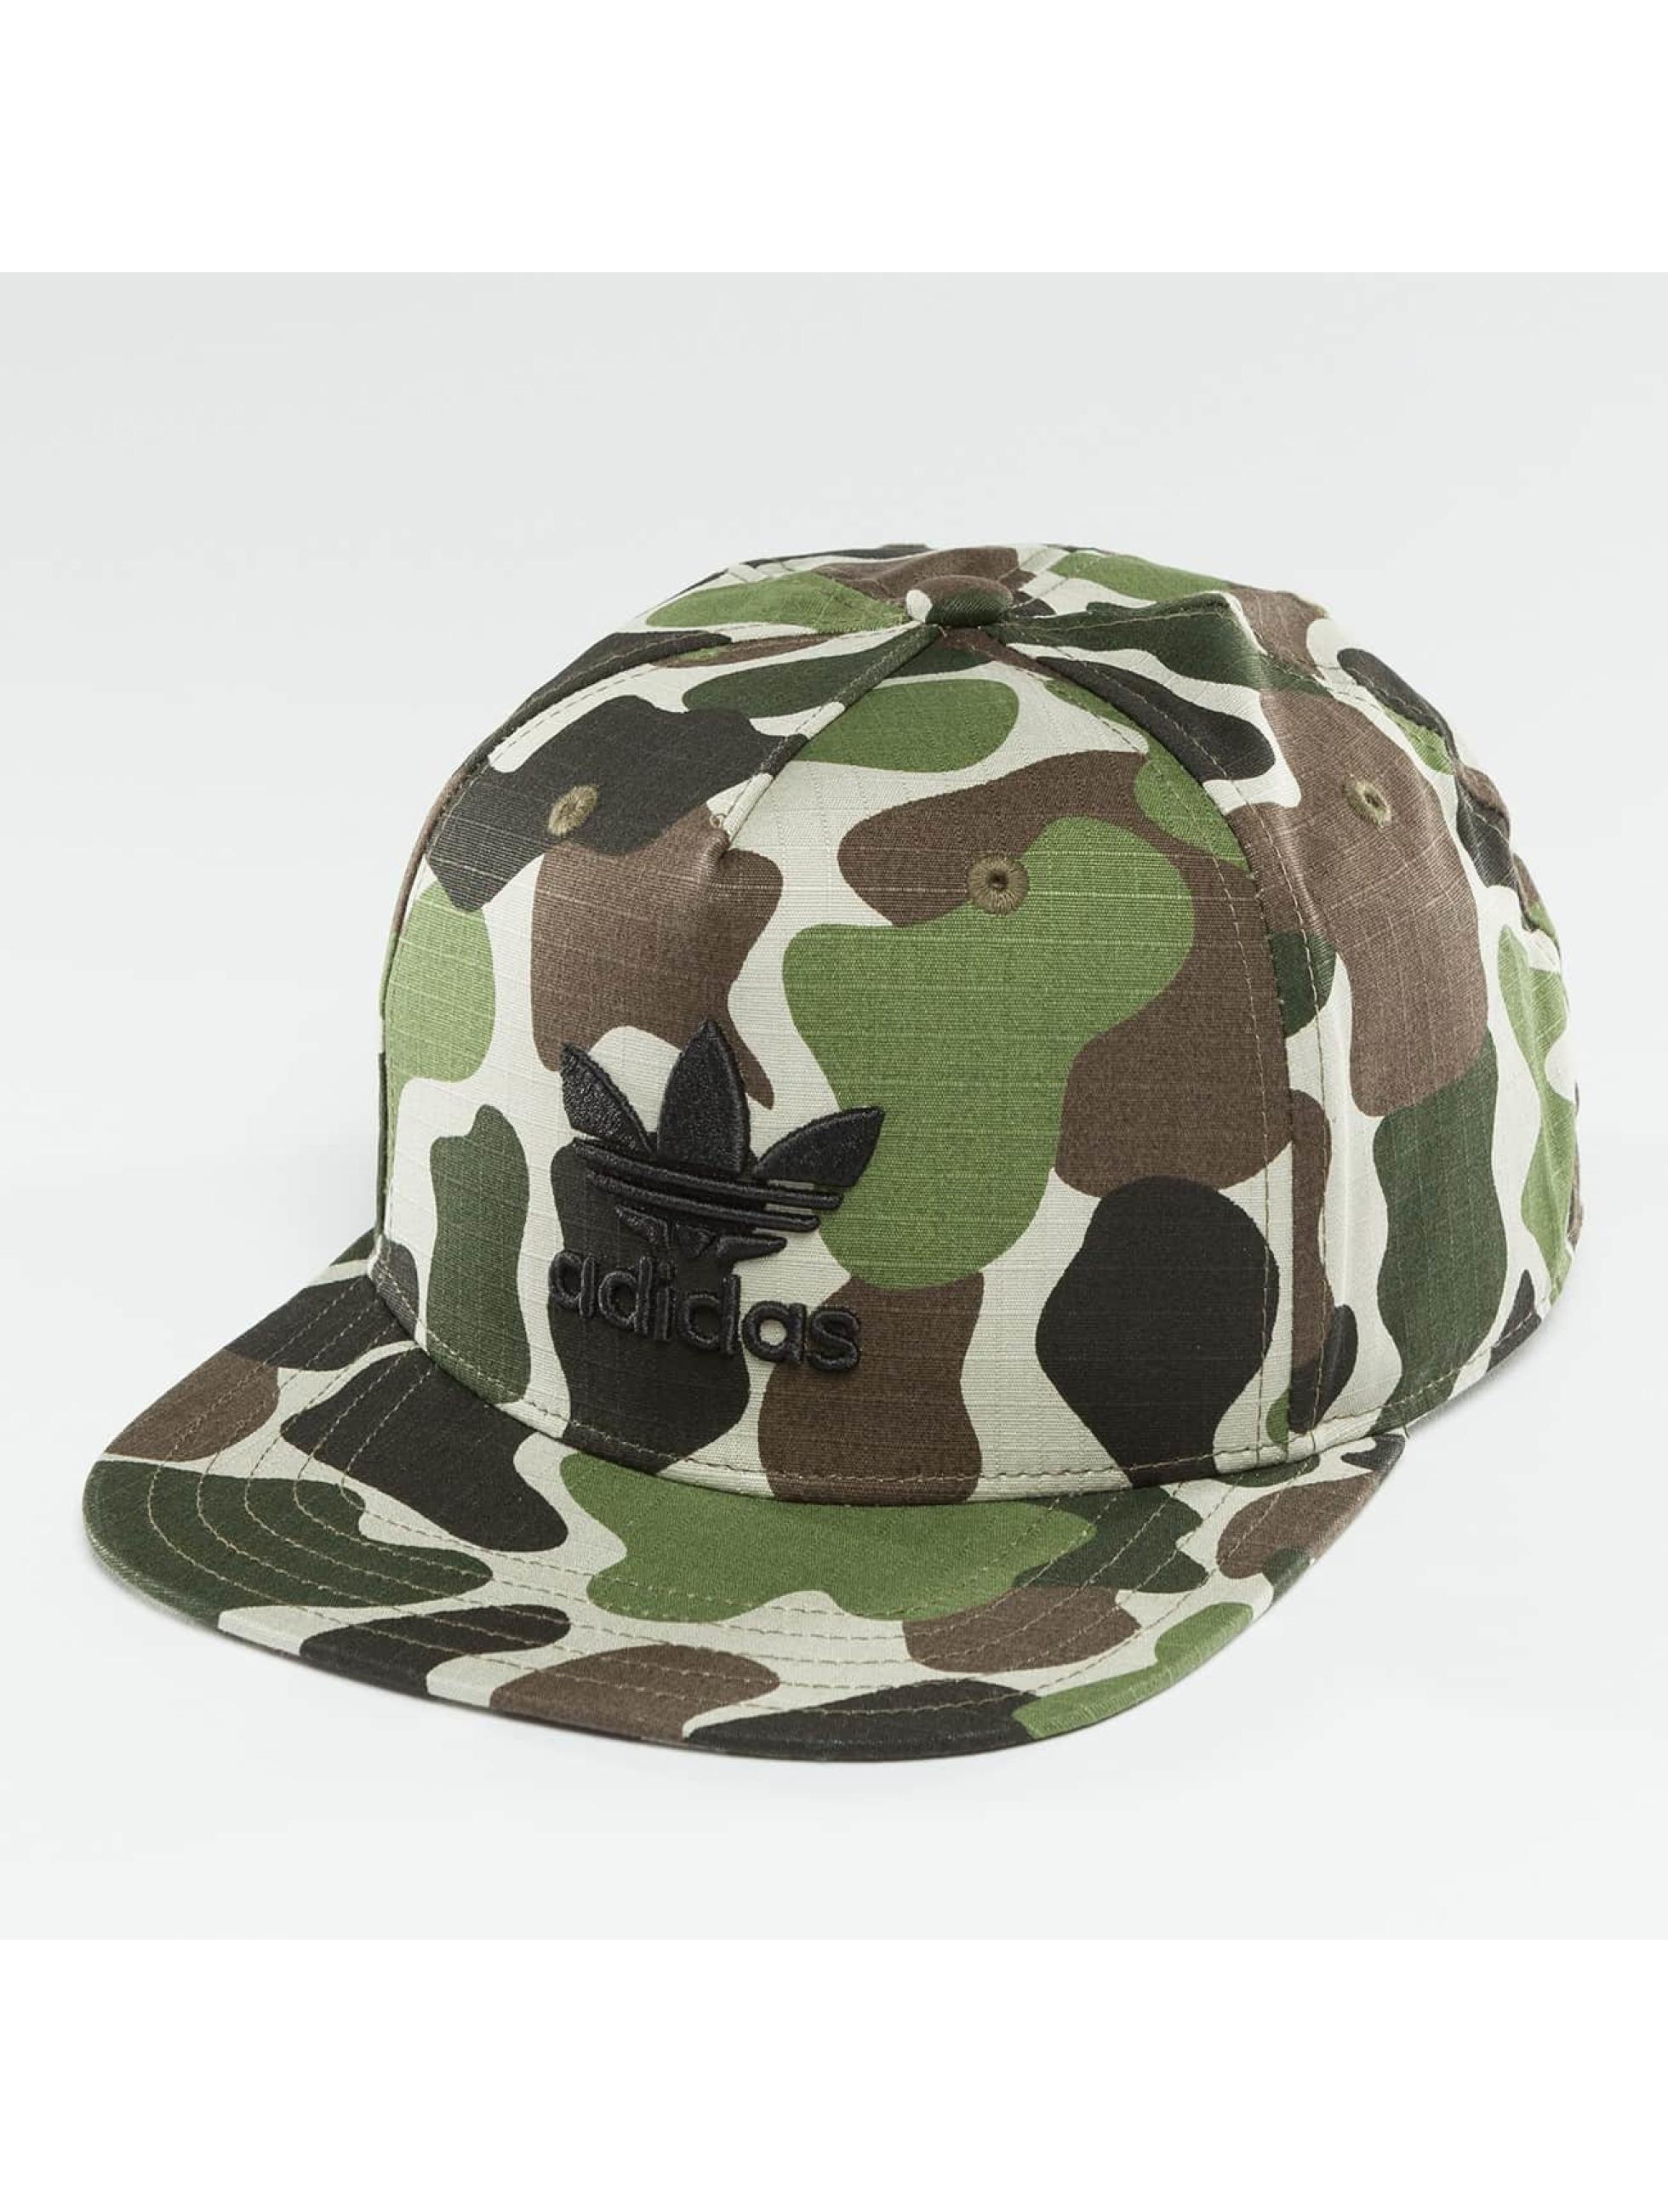 adidas Snapback Caps Camo camouflage